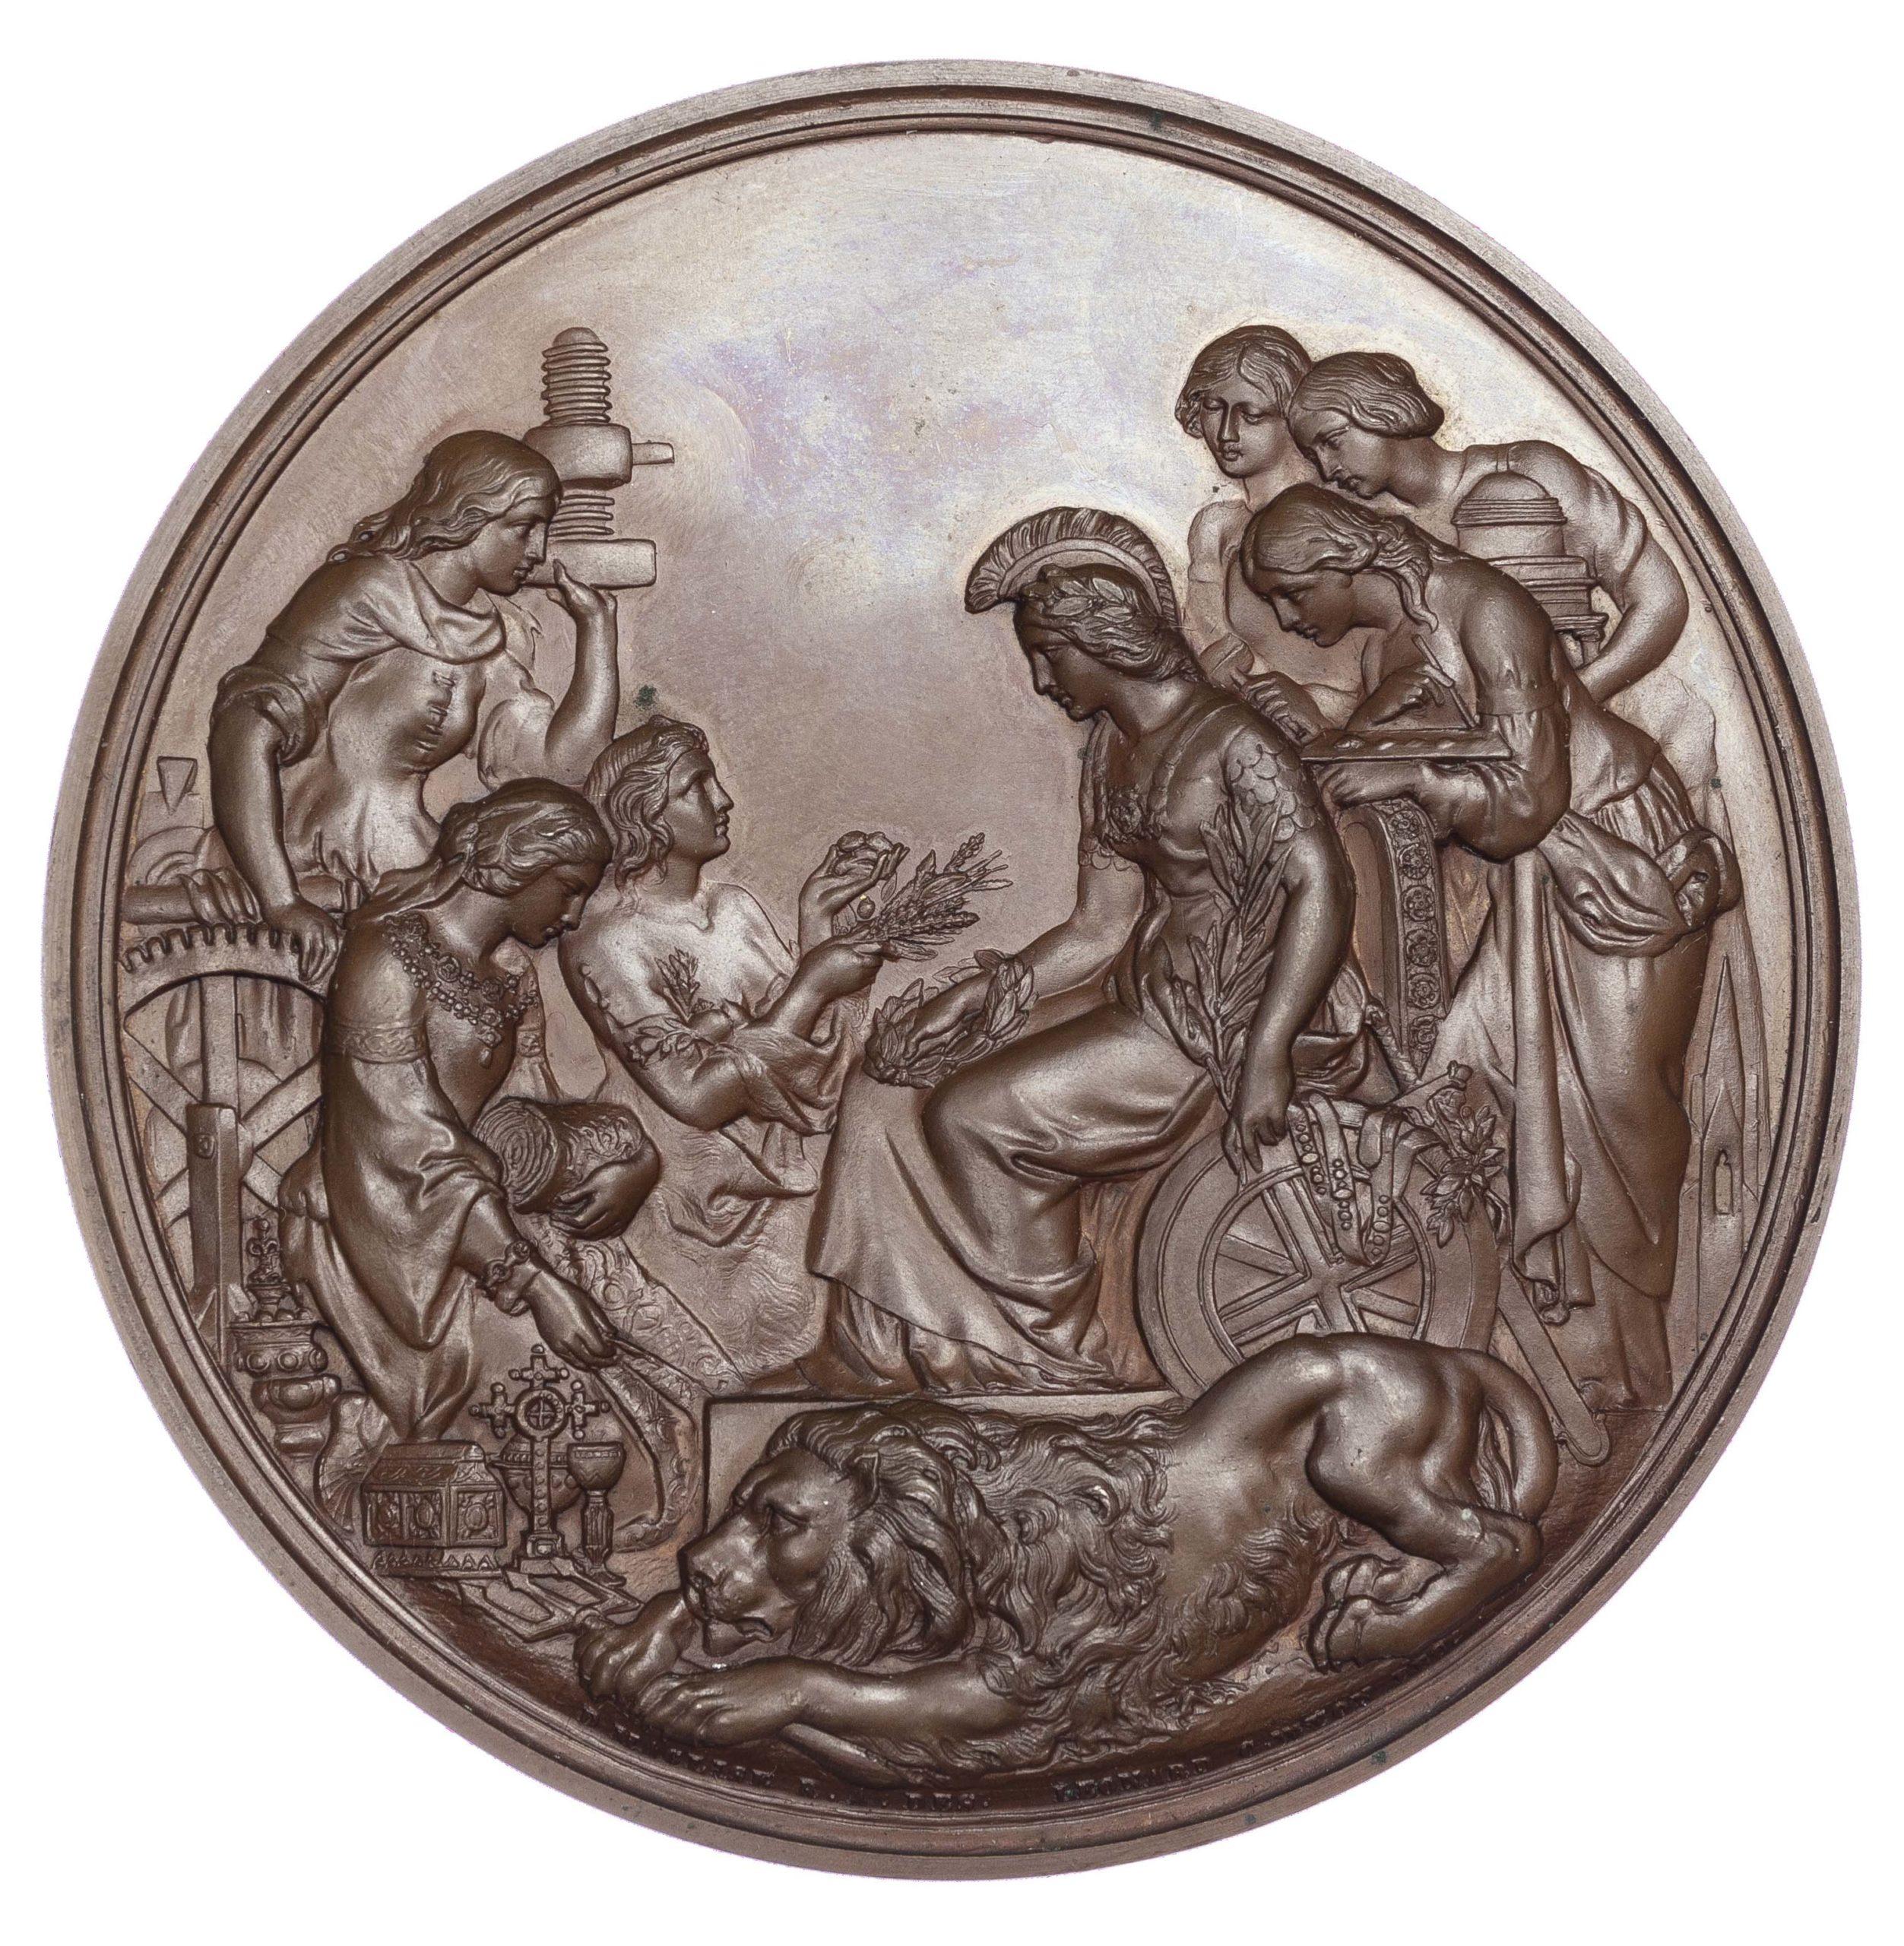 Victoria, 1862 International Exhibition London – Jurors' medal, AE medal